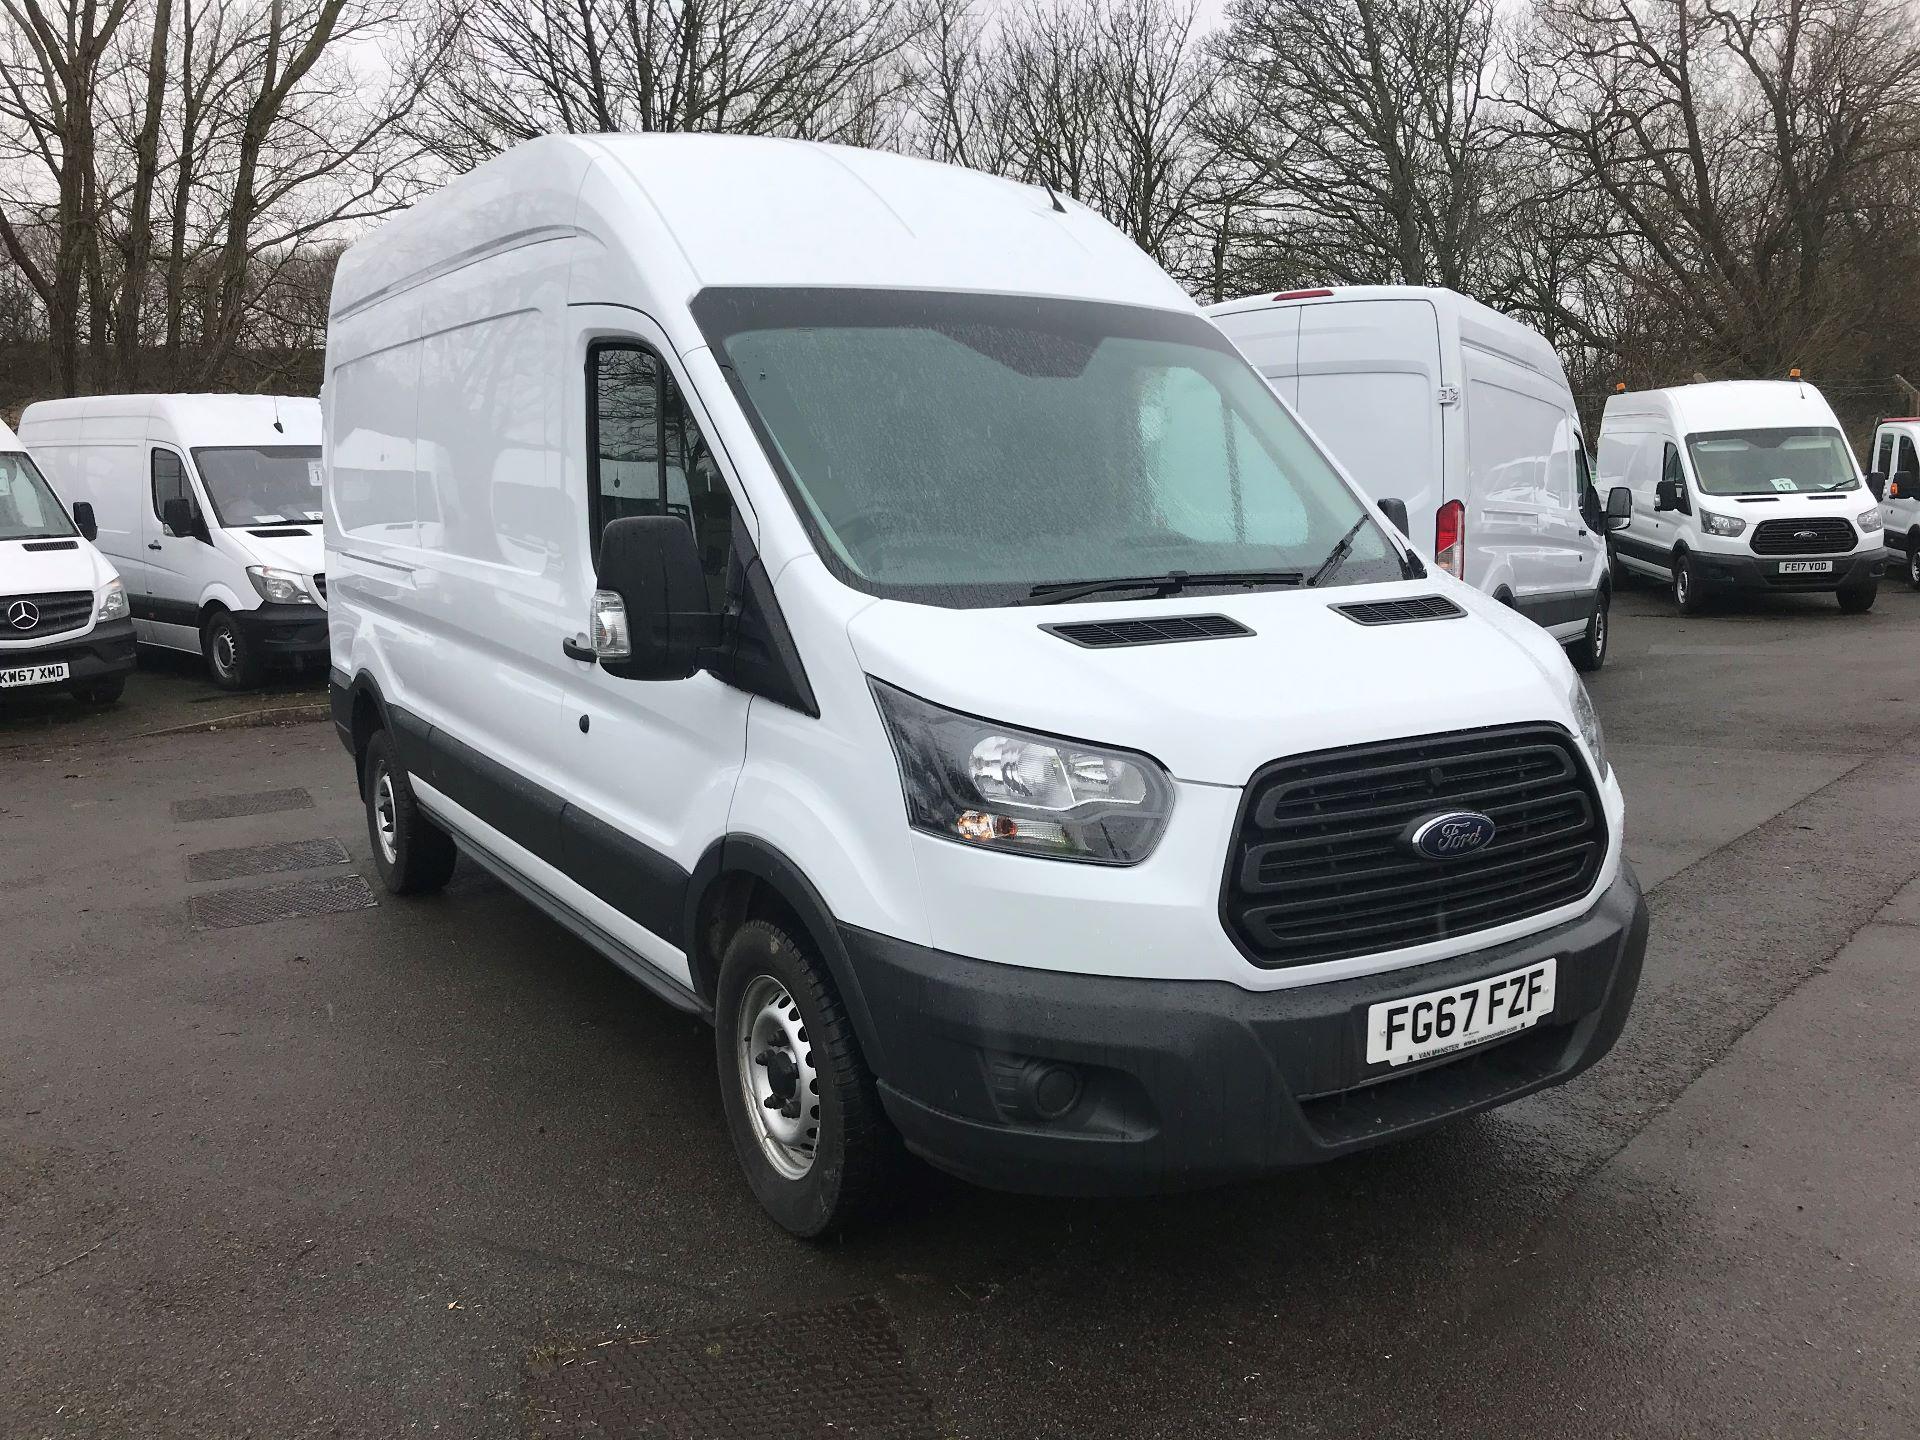 2017 Ford Transit L3 H3 VAN 130PS EURO 6 (FG67FZF)